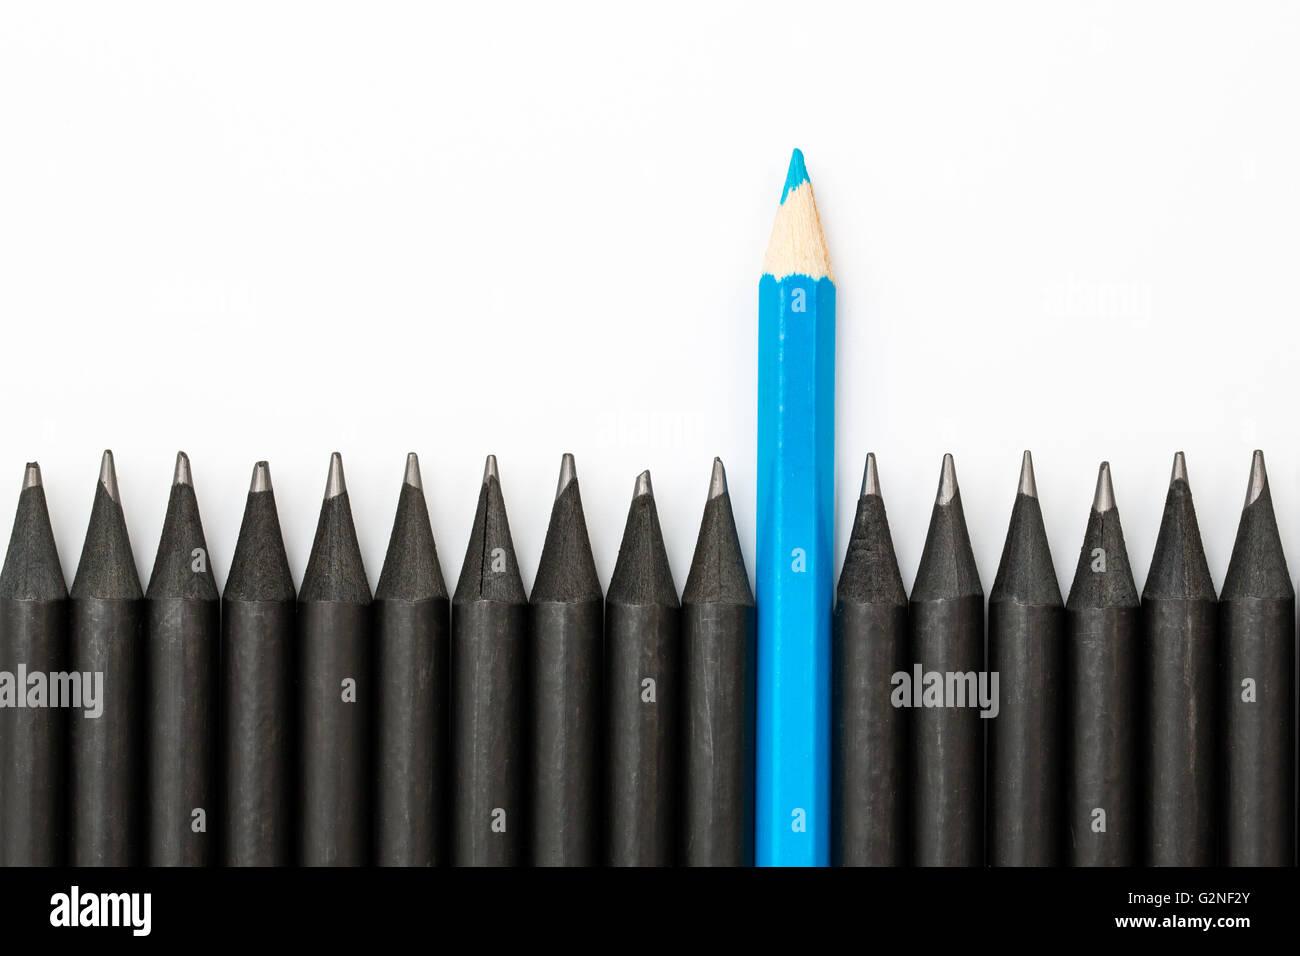 Lápiz azul destacándose desde la fila de lápices de color negro. Imagen De Stock